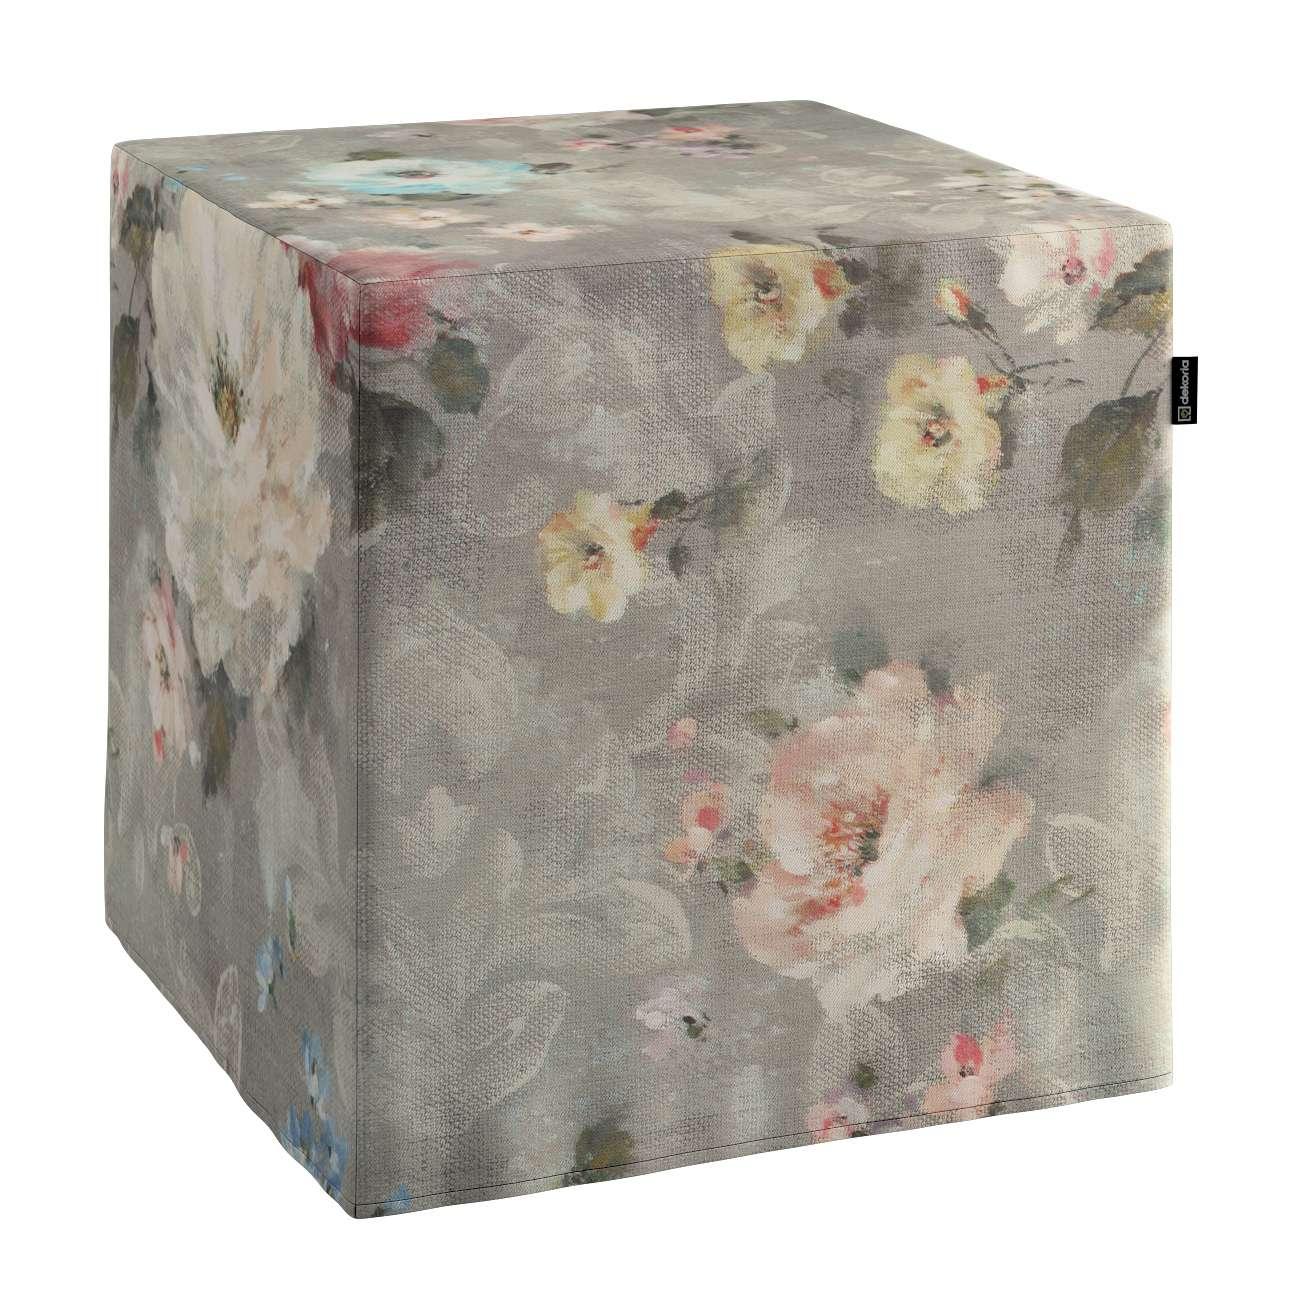 Sedák Cube - kostka pevná 40x40x40 v kolekci Monet, látka: 137-81